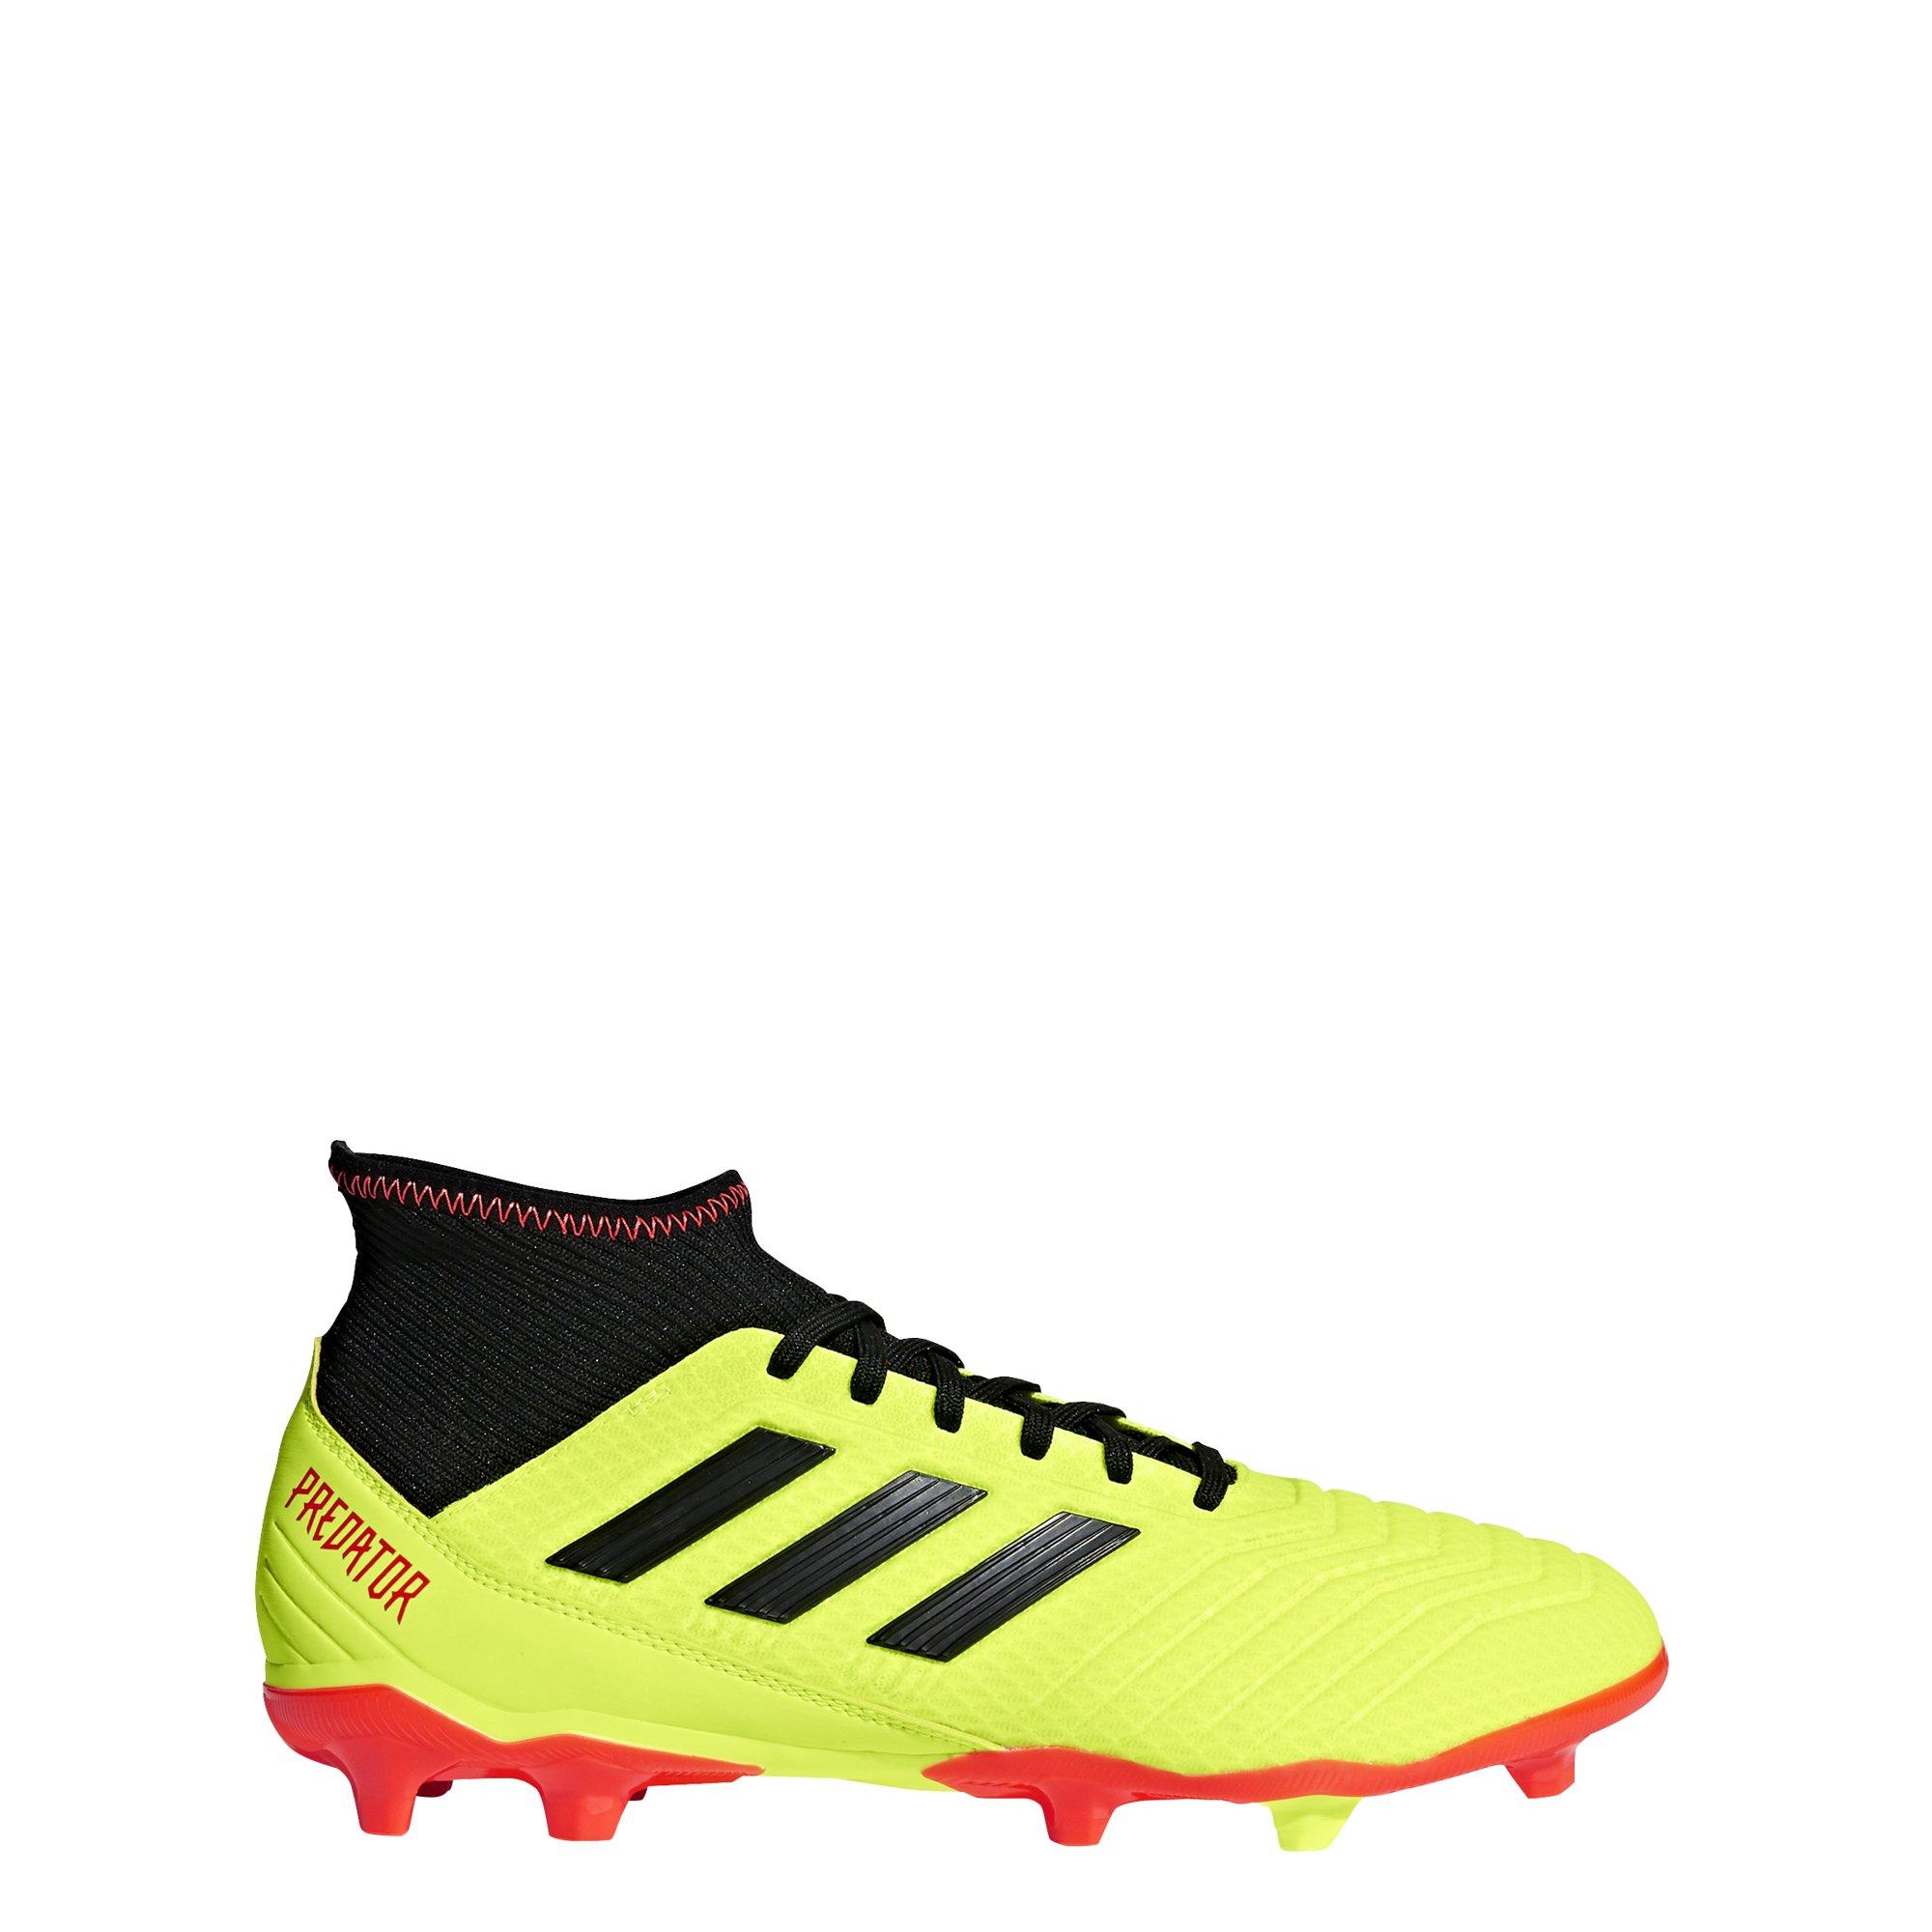 adidas Men's Predator 18.3 FG Soccer Shoe, Yellow/Black/Solar red, 8 M US by adidas